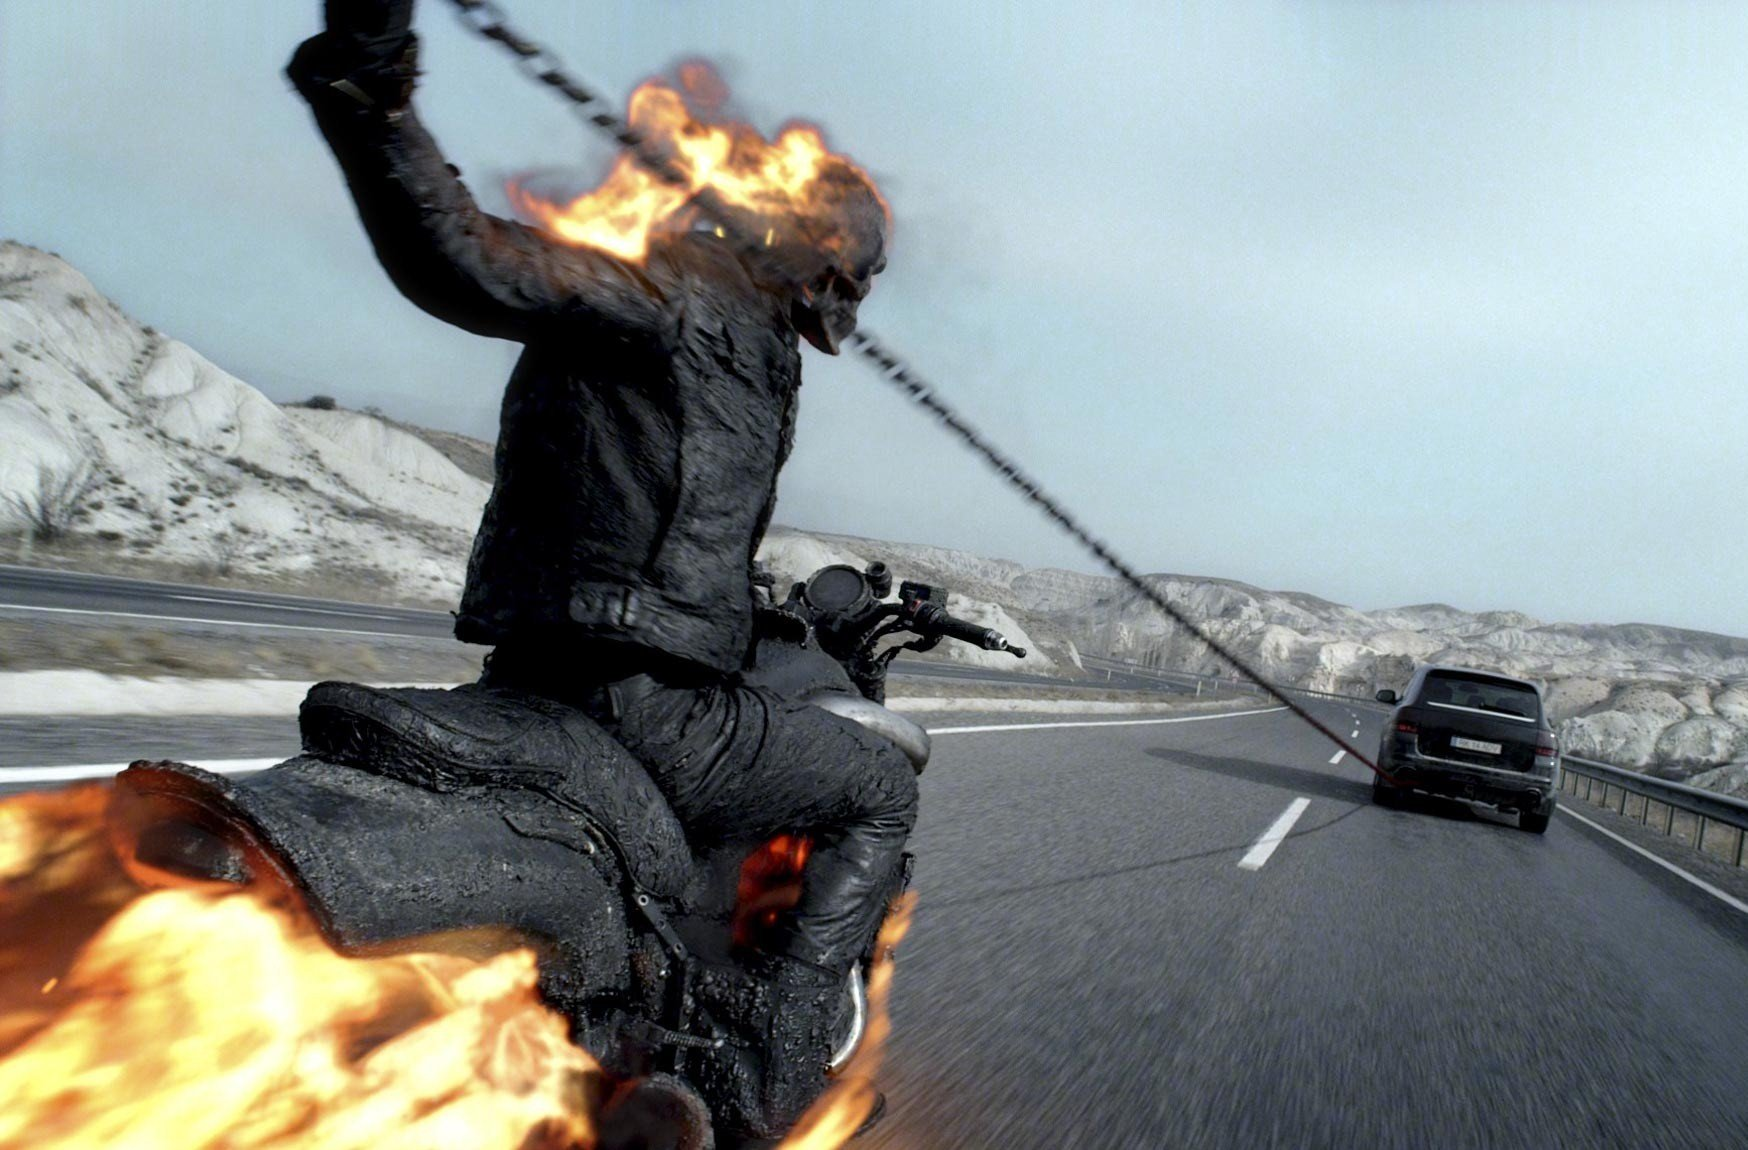 Image Ghost rider 2 spirit of vengeance